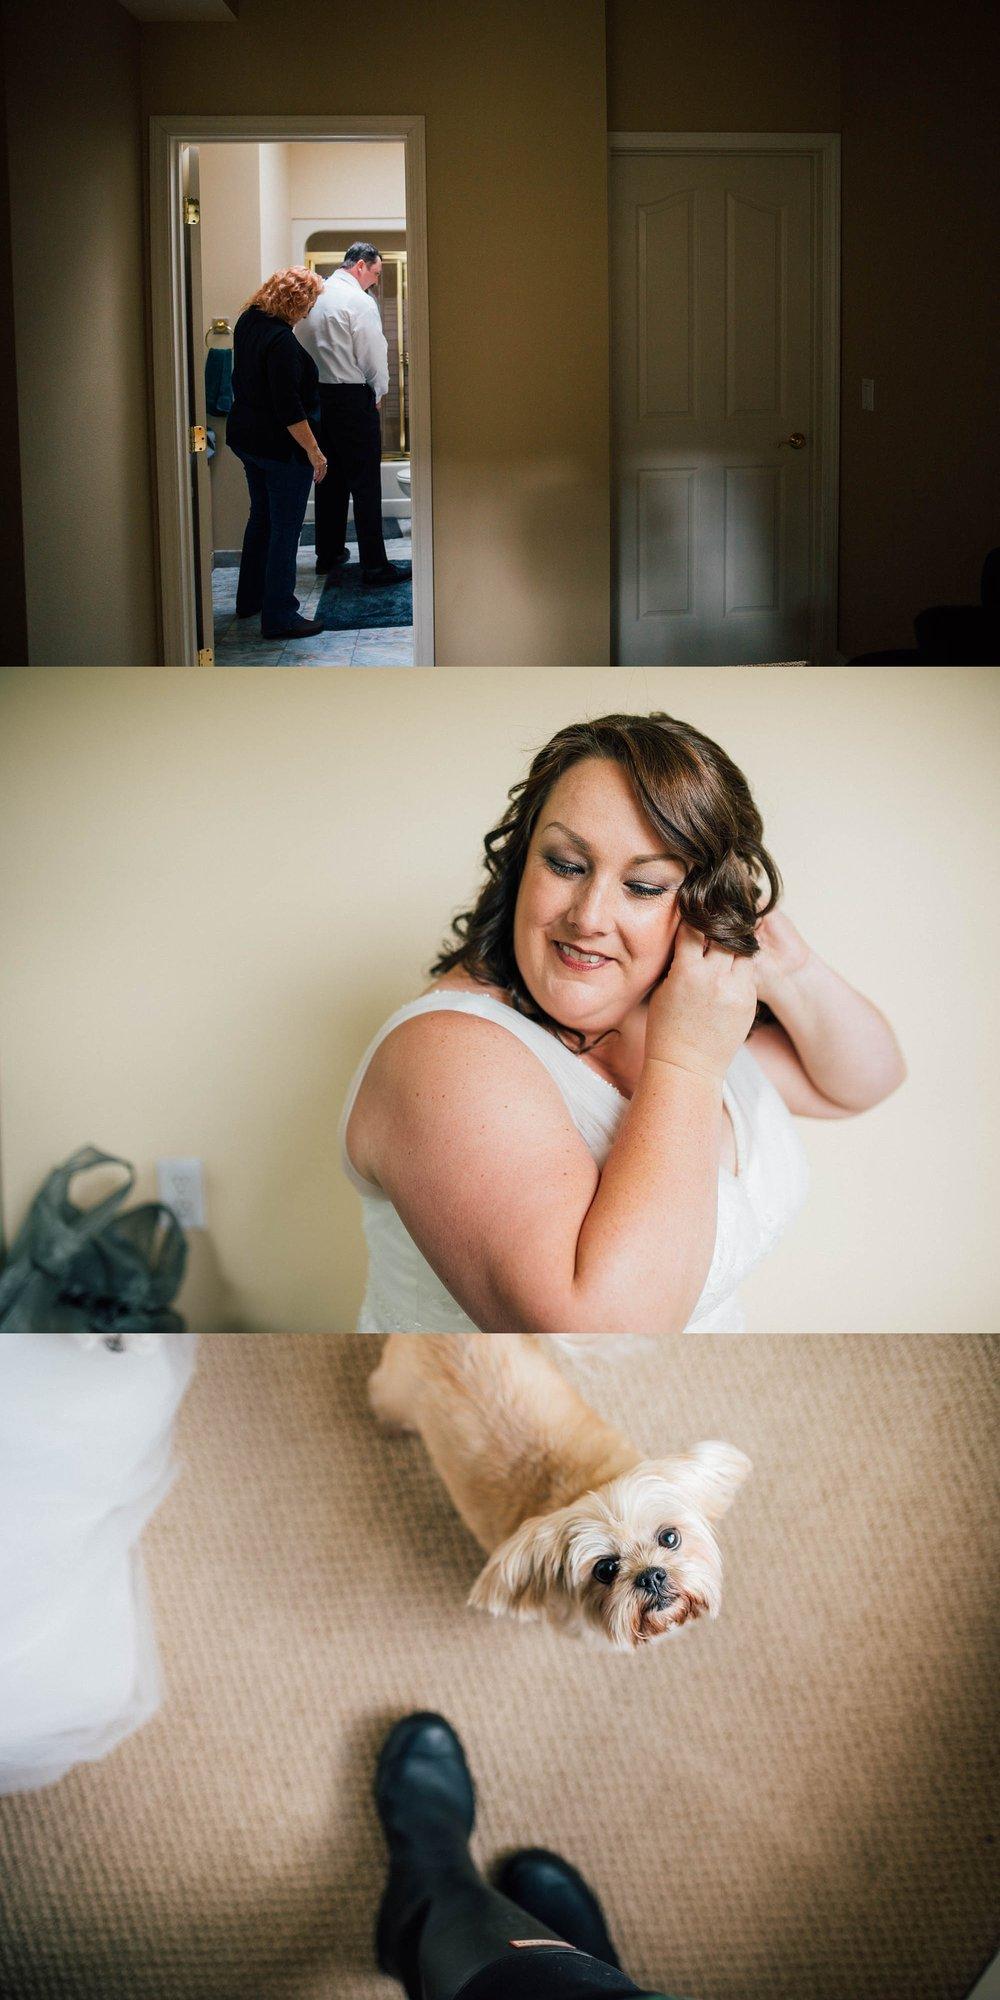 ashley_vos_seattle_ wedding_photographer_0222.jpg